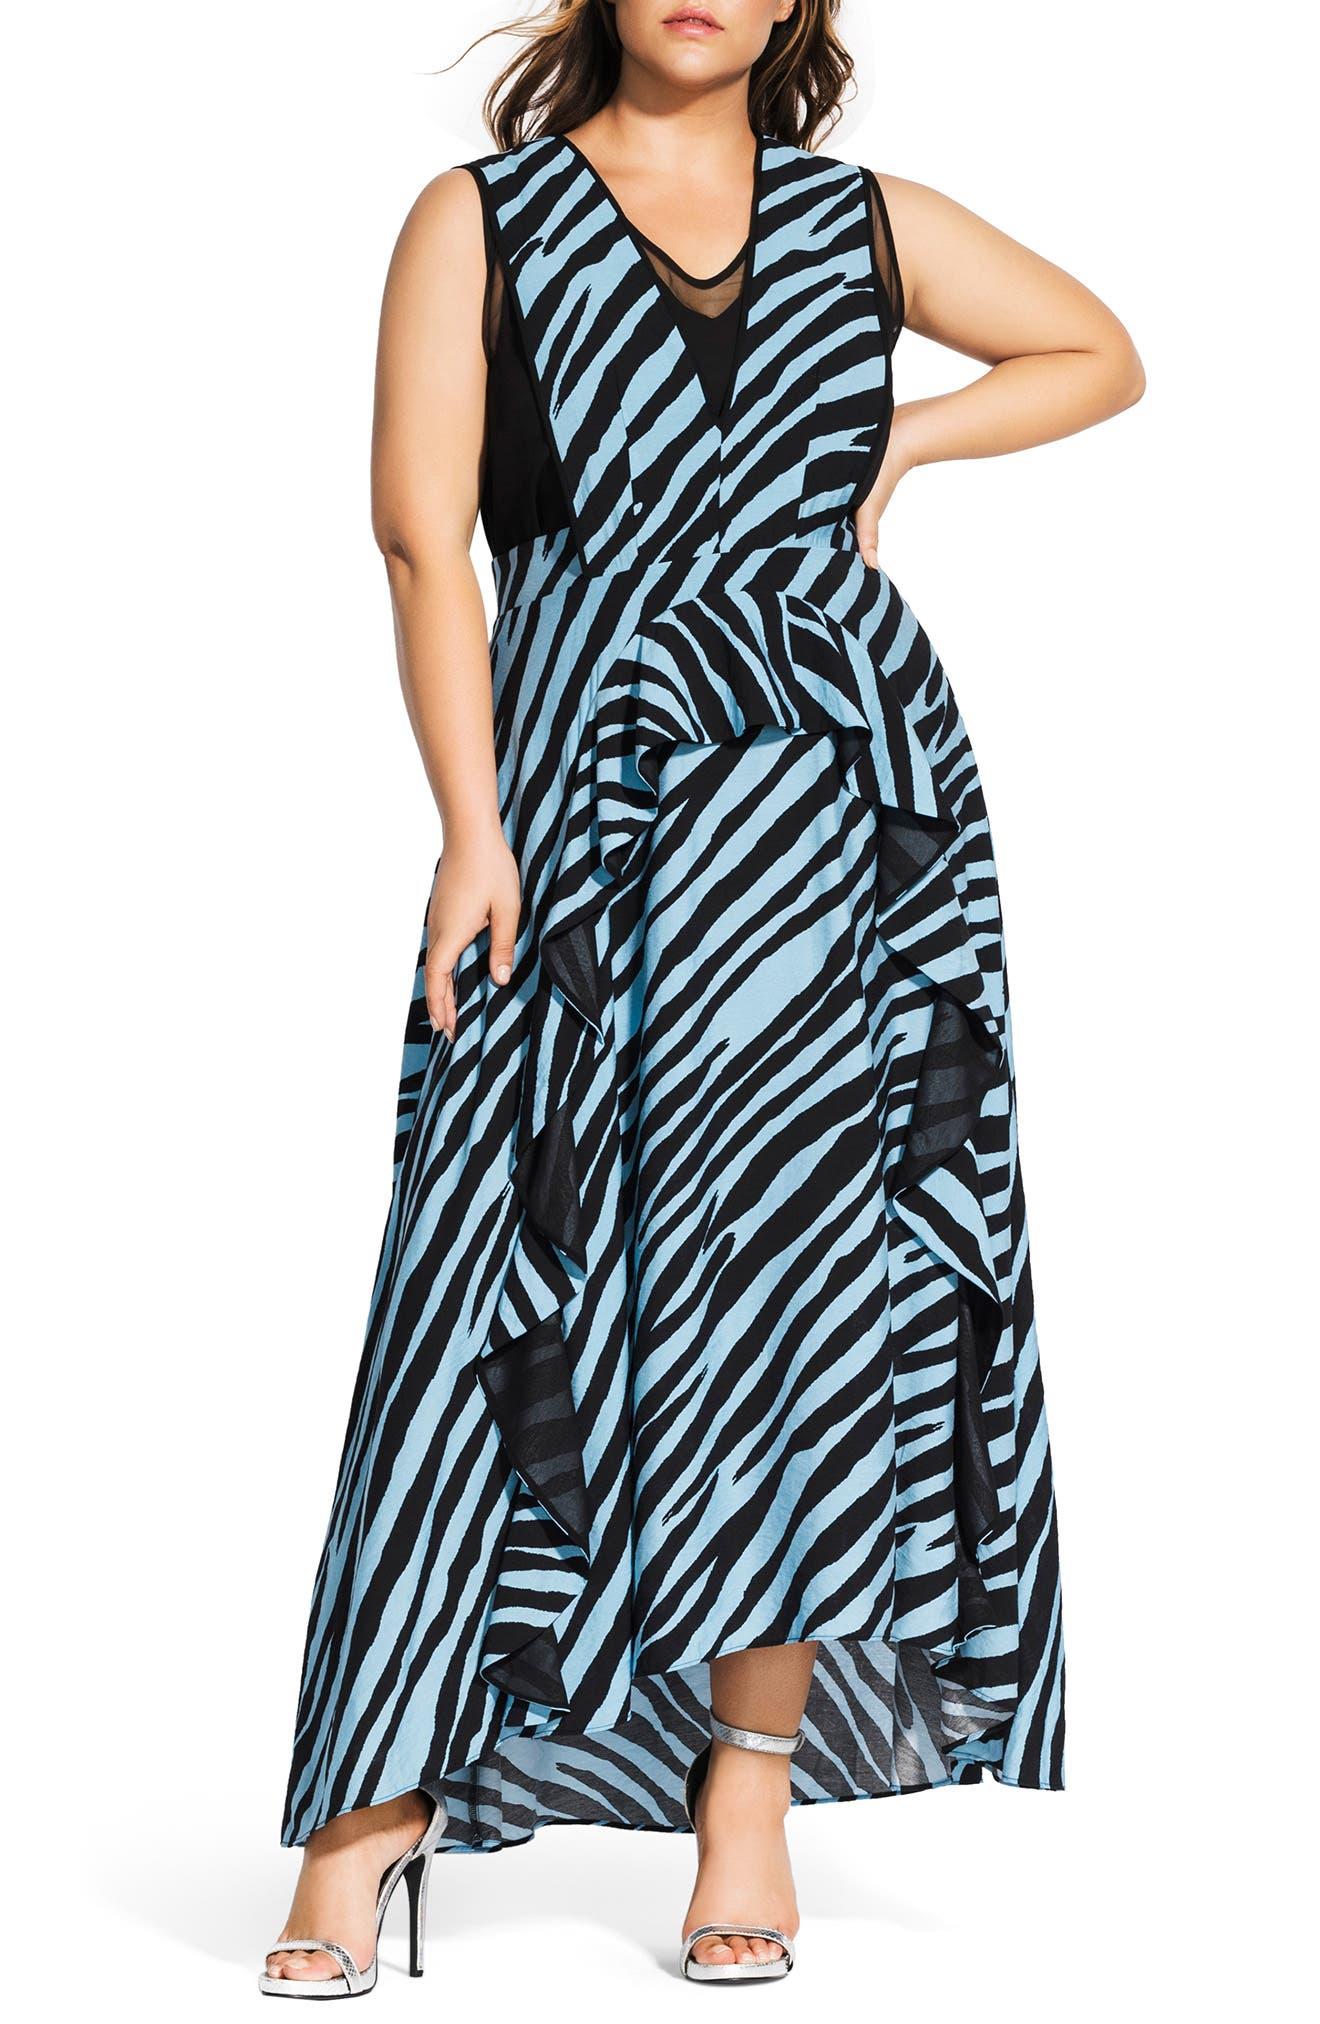 Plus Size City Chic Blue Zebra Maxi Dress, Black